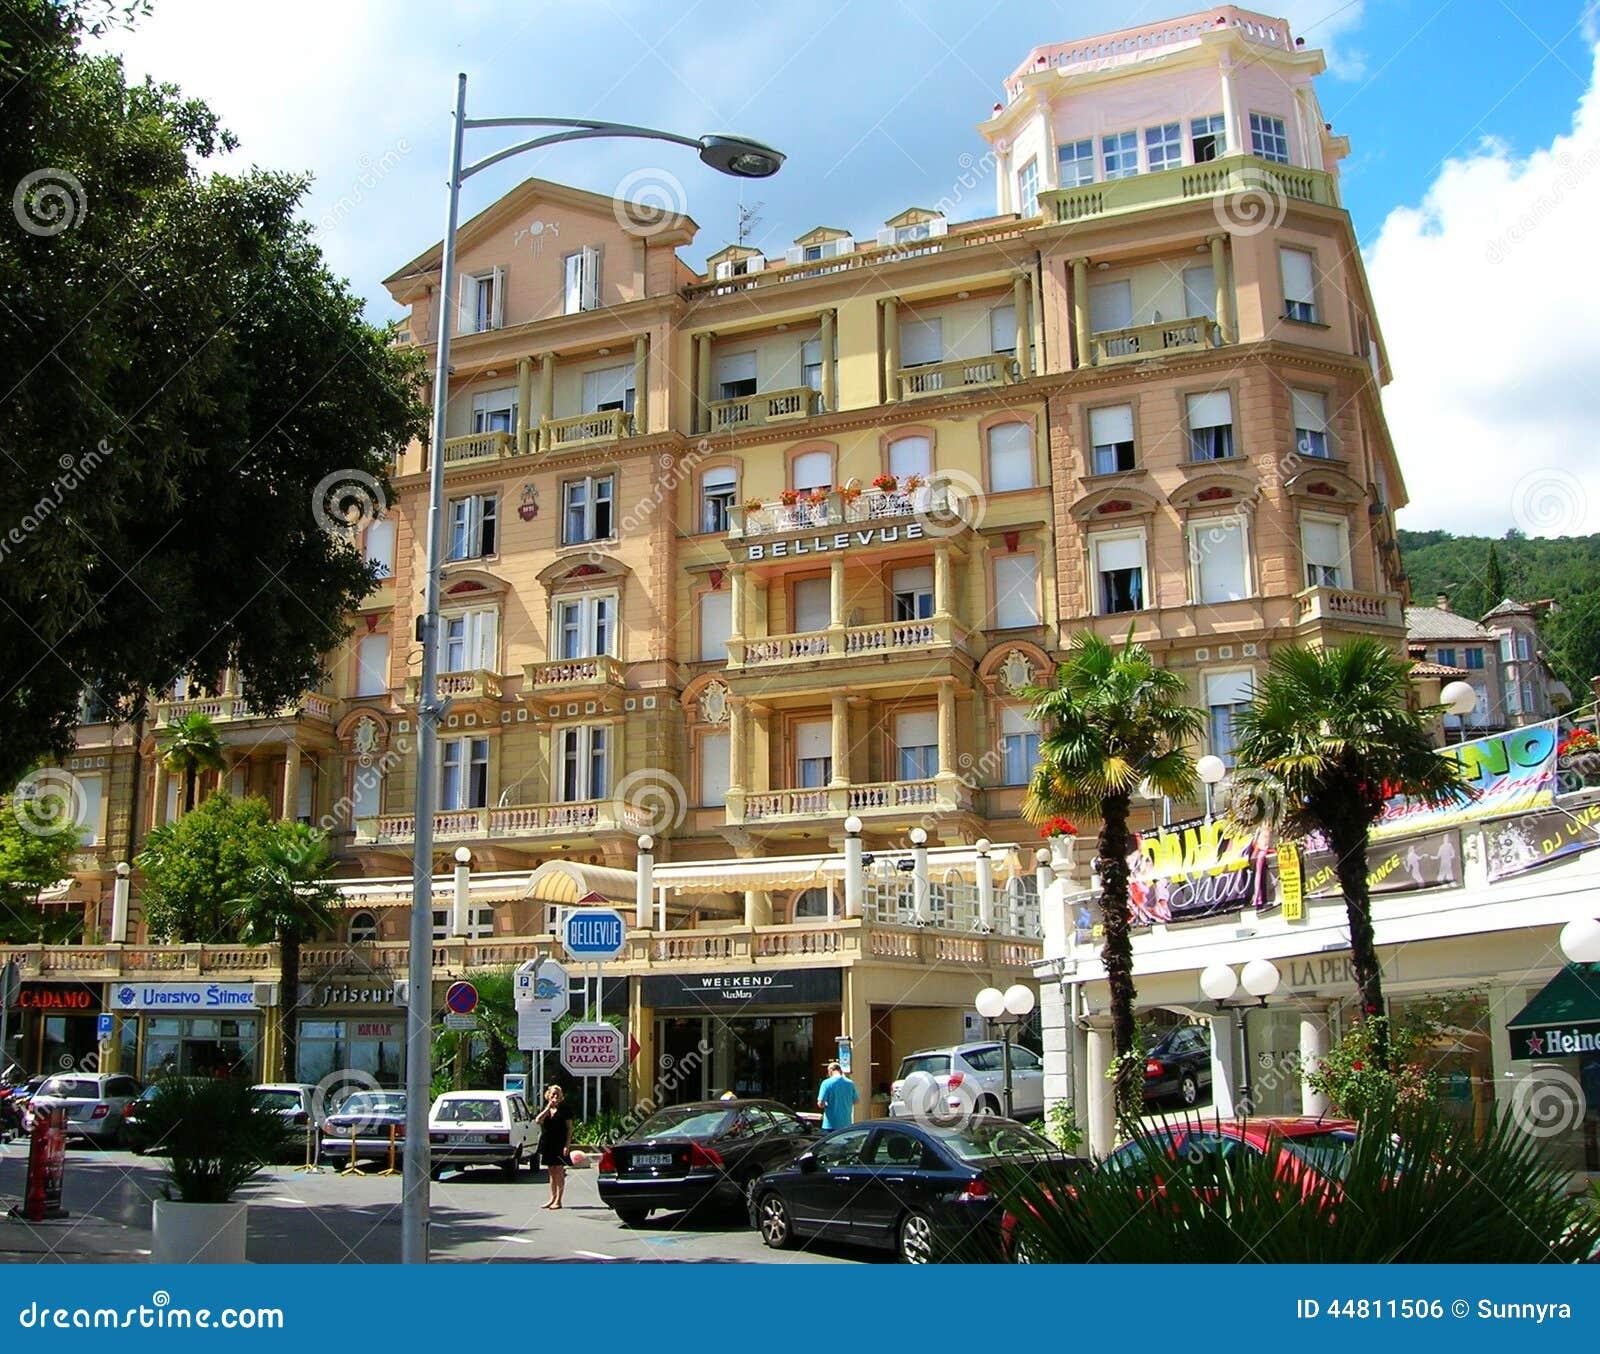 Hotel in opatija croatia editorial photo image 44811506 for Design hotel opatija croatia